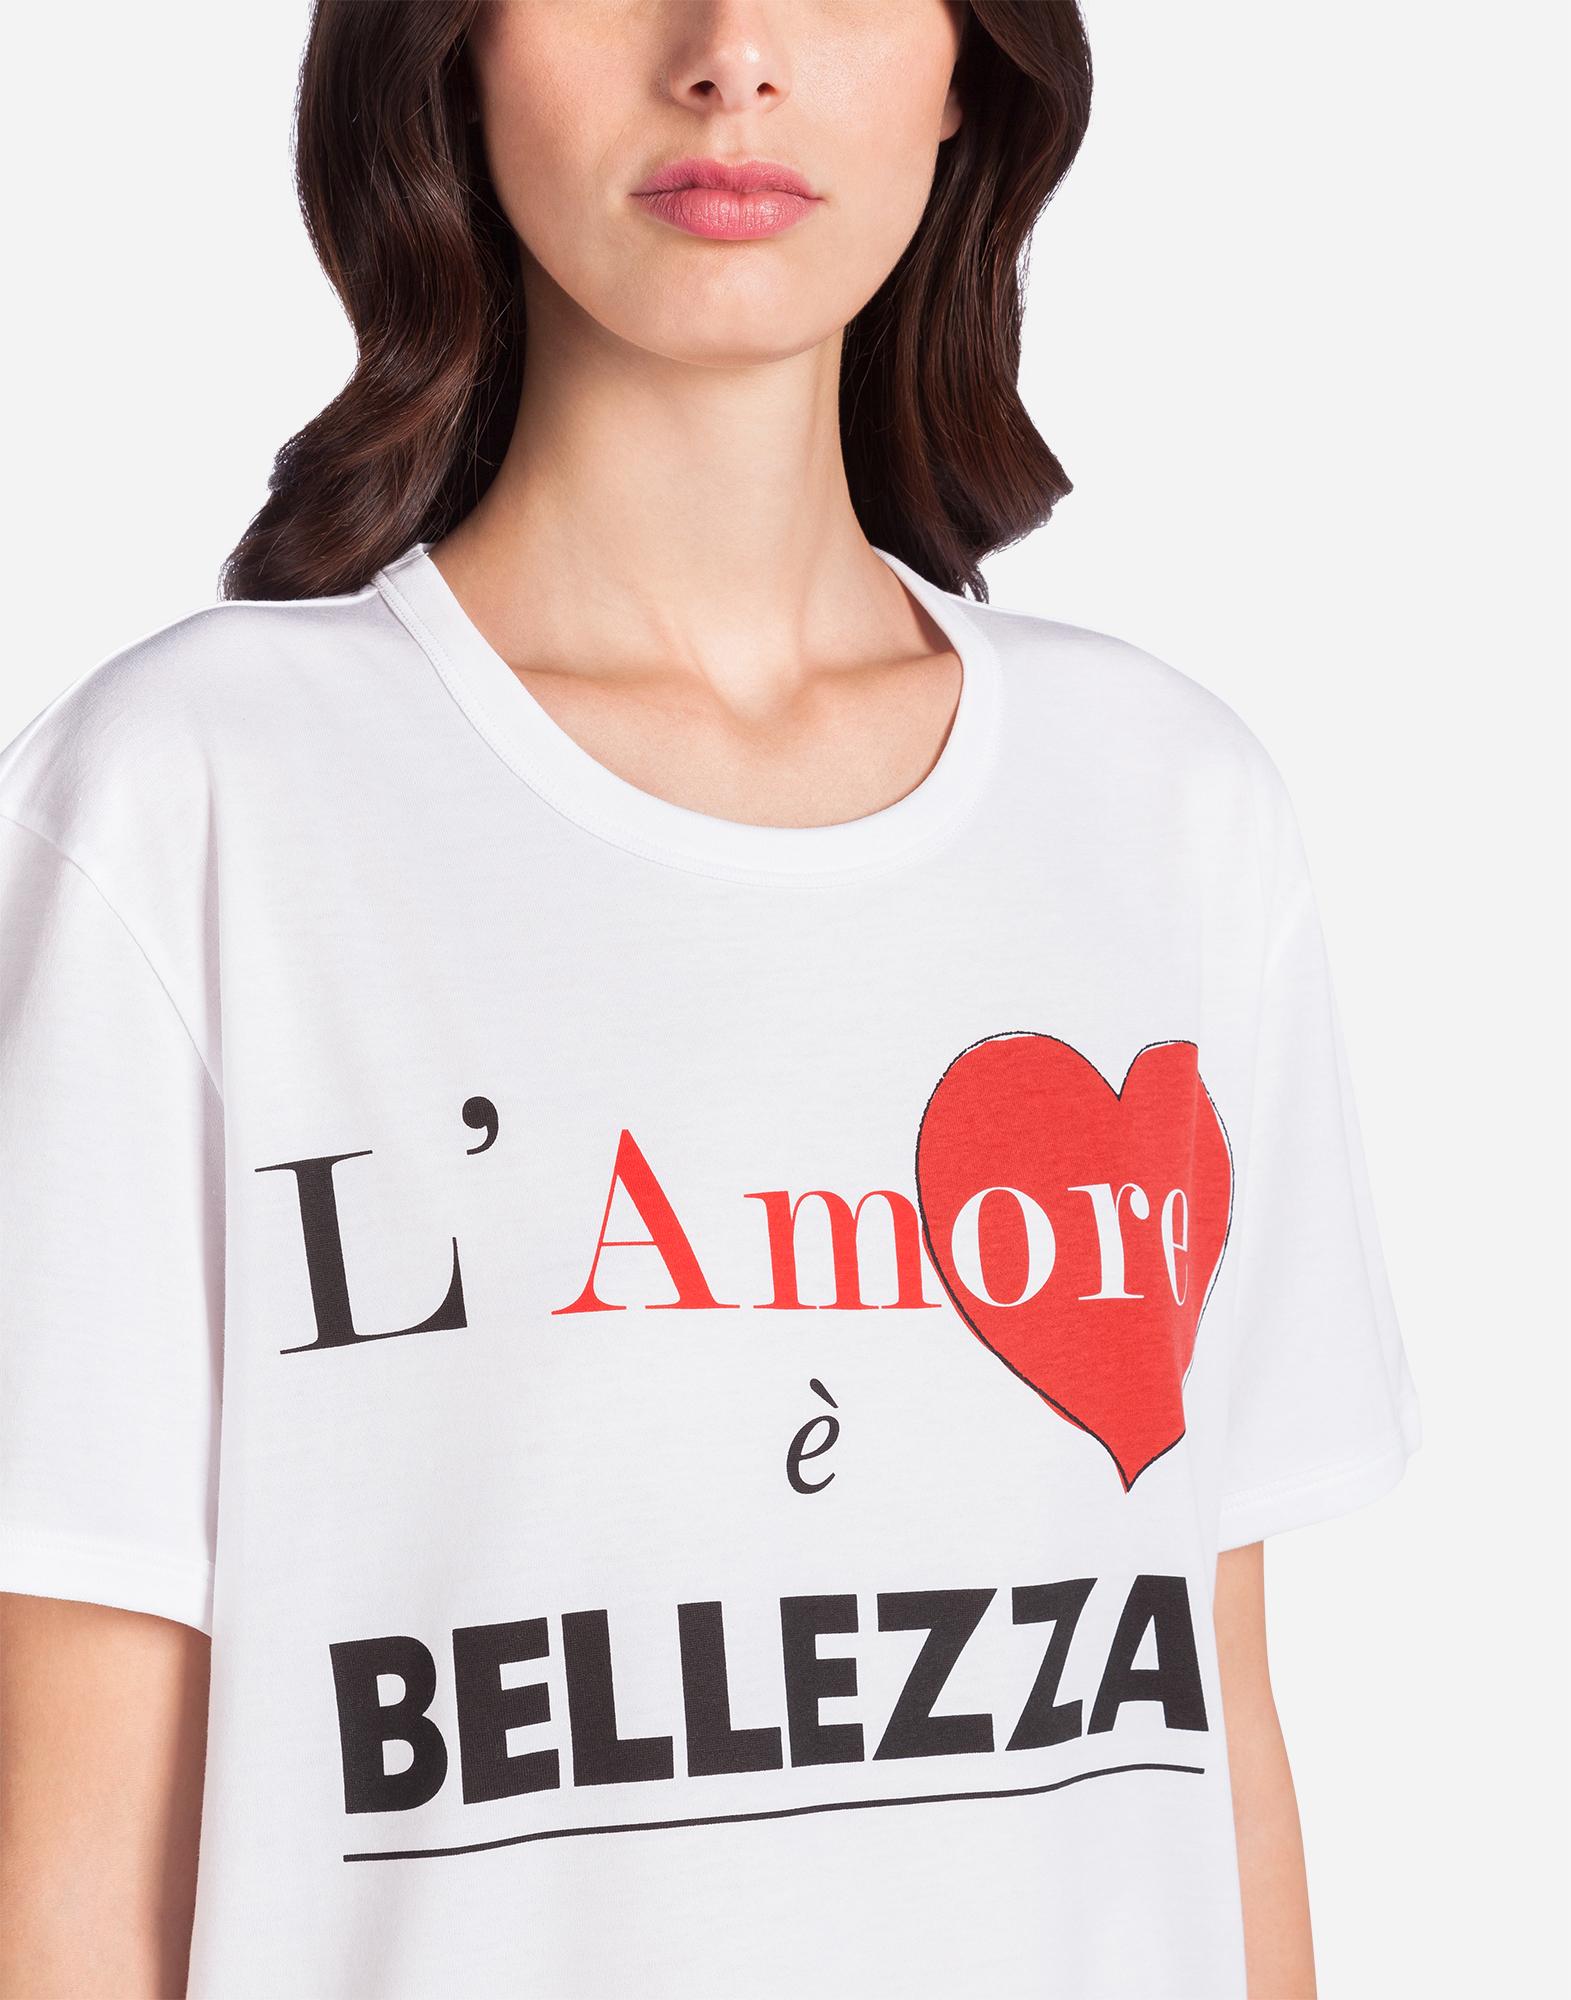 L'AMORE È BELLEZZA T-SHIRT